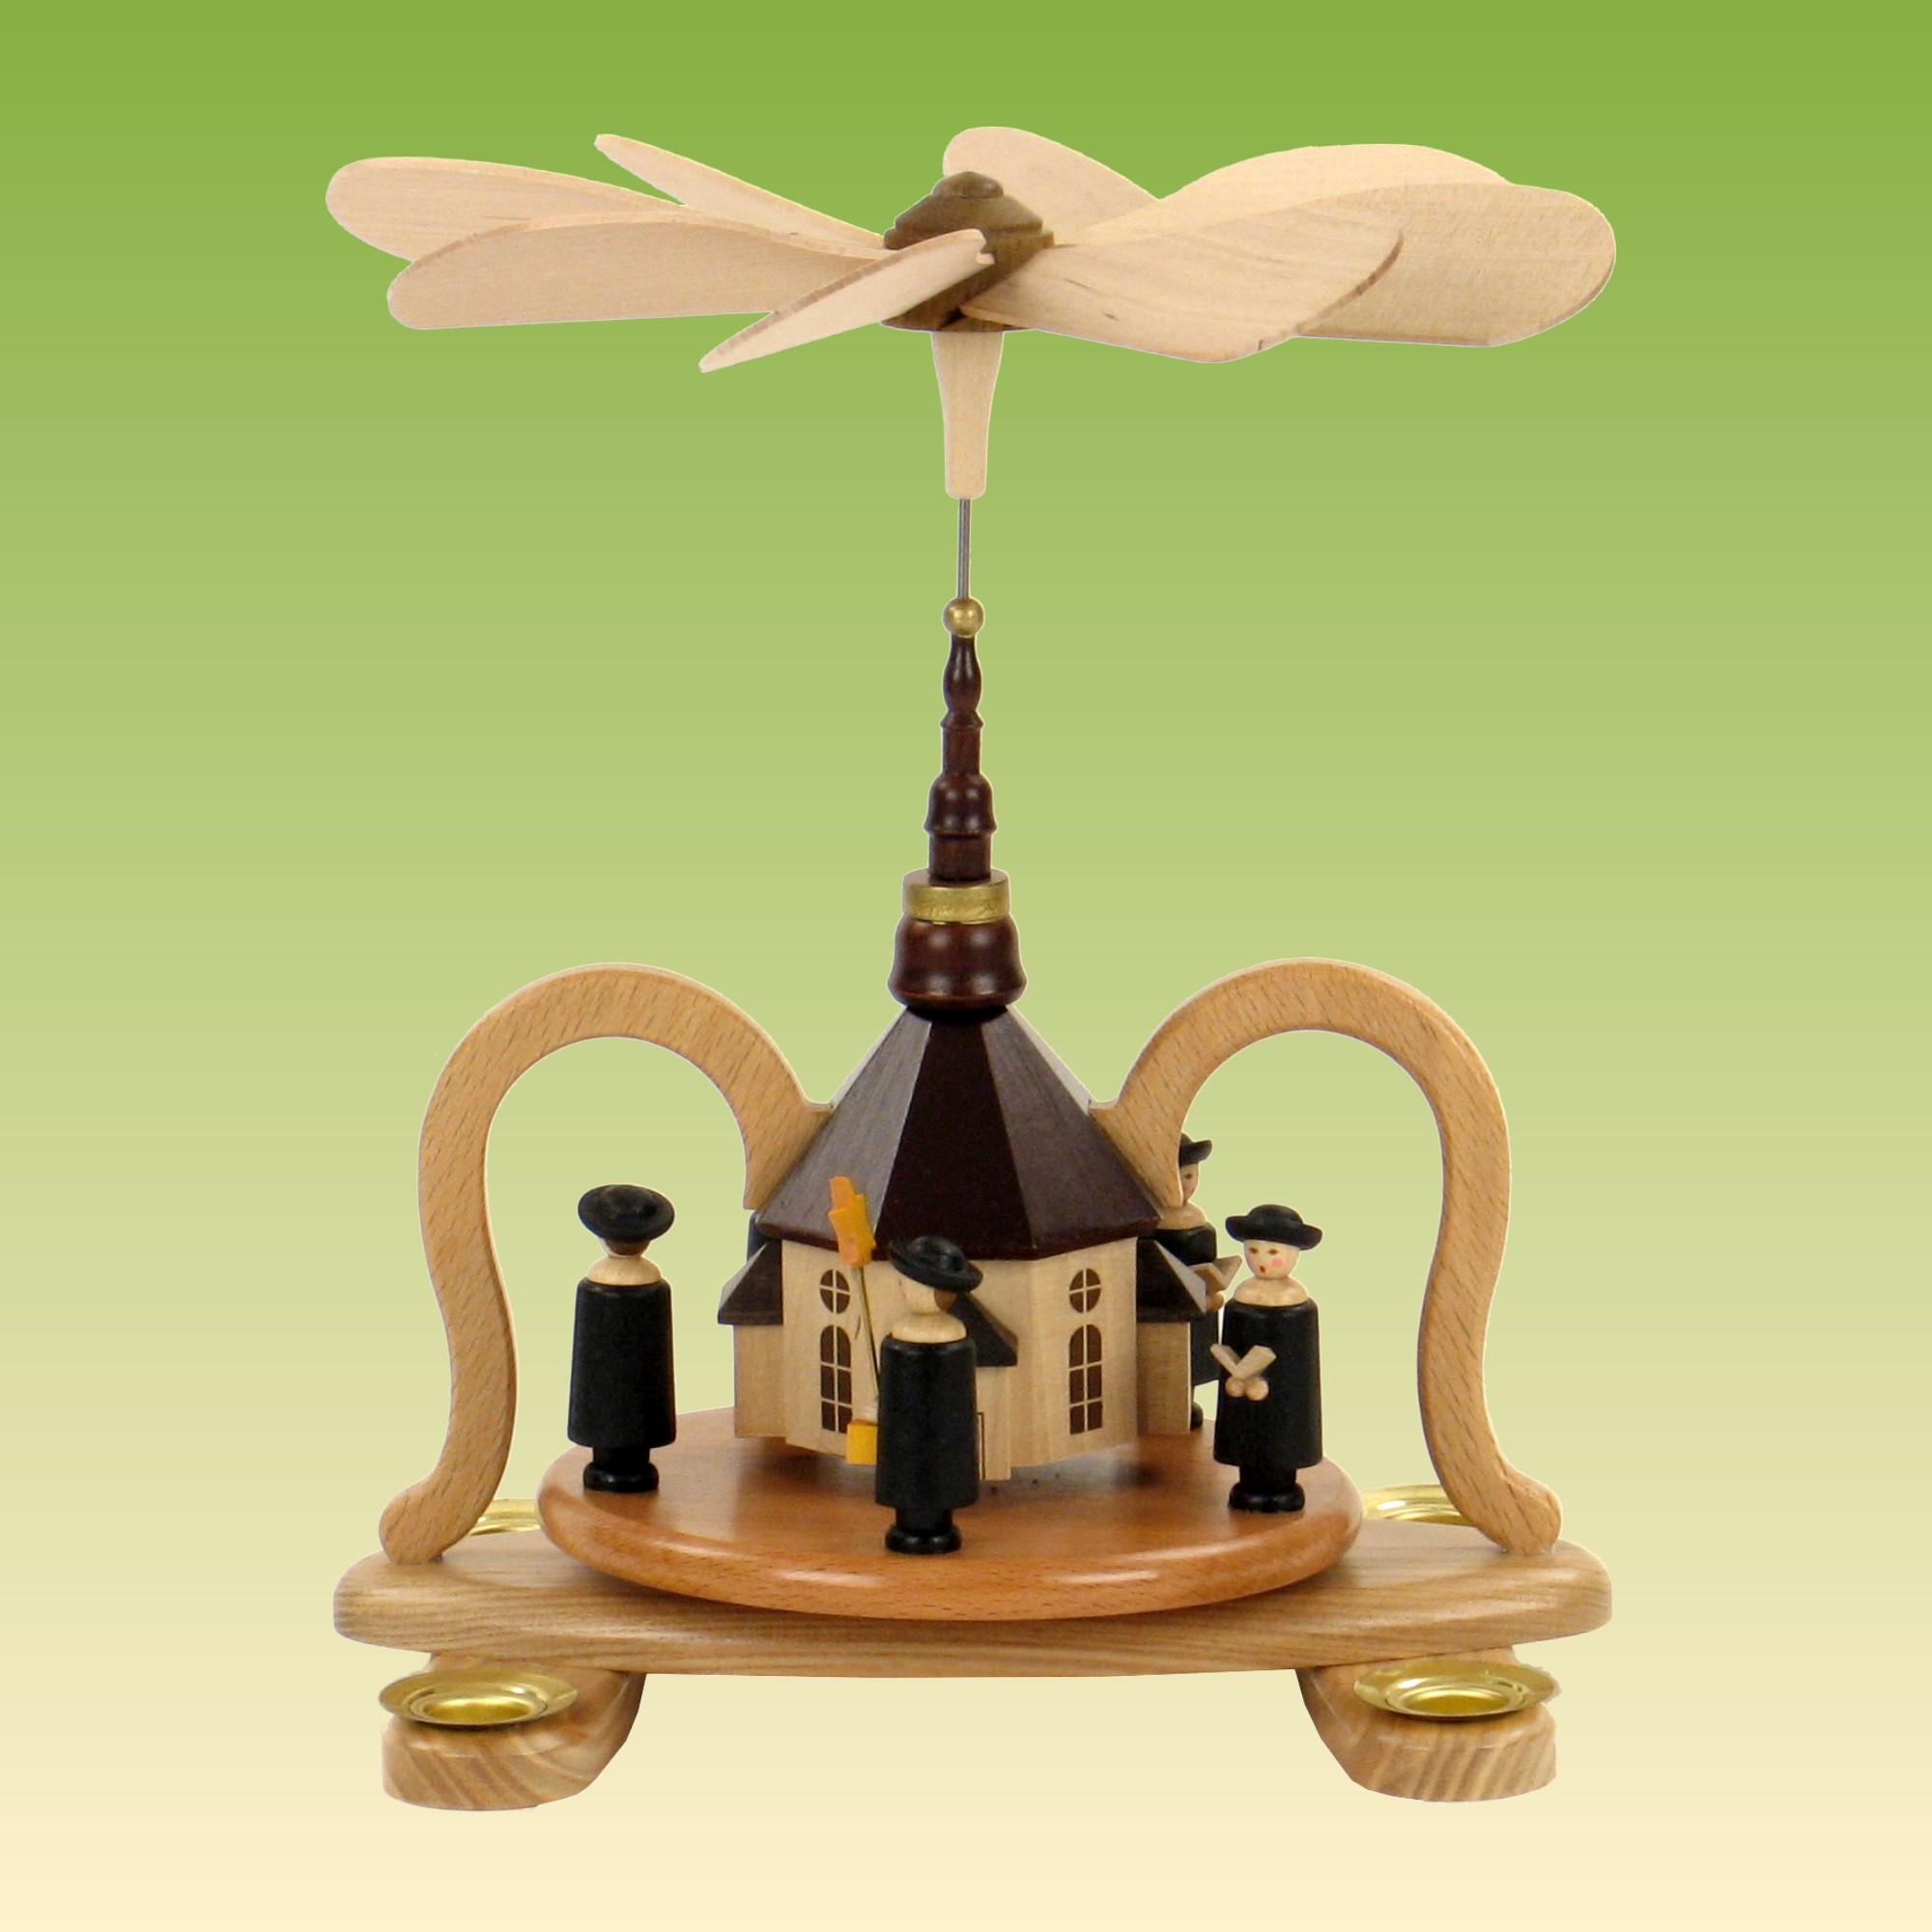 pyramide mit seiffener kirche pyramiden natur. Black Bedroom Furniture Sets. Home Design Ideas